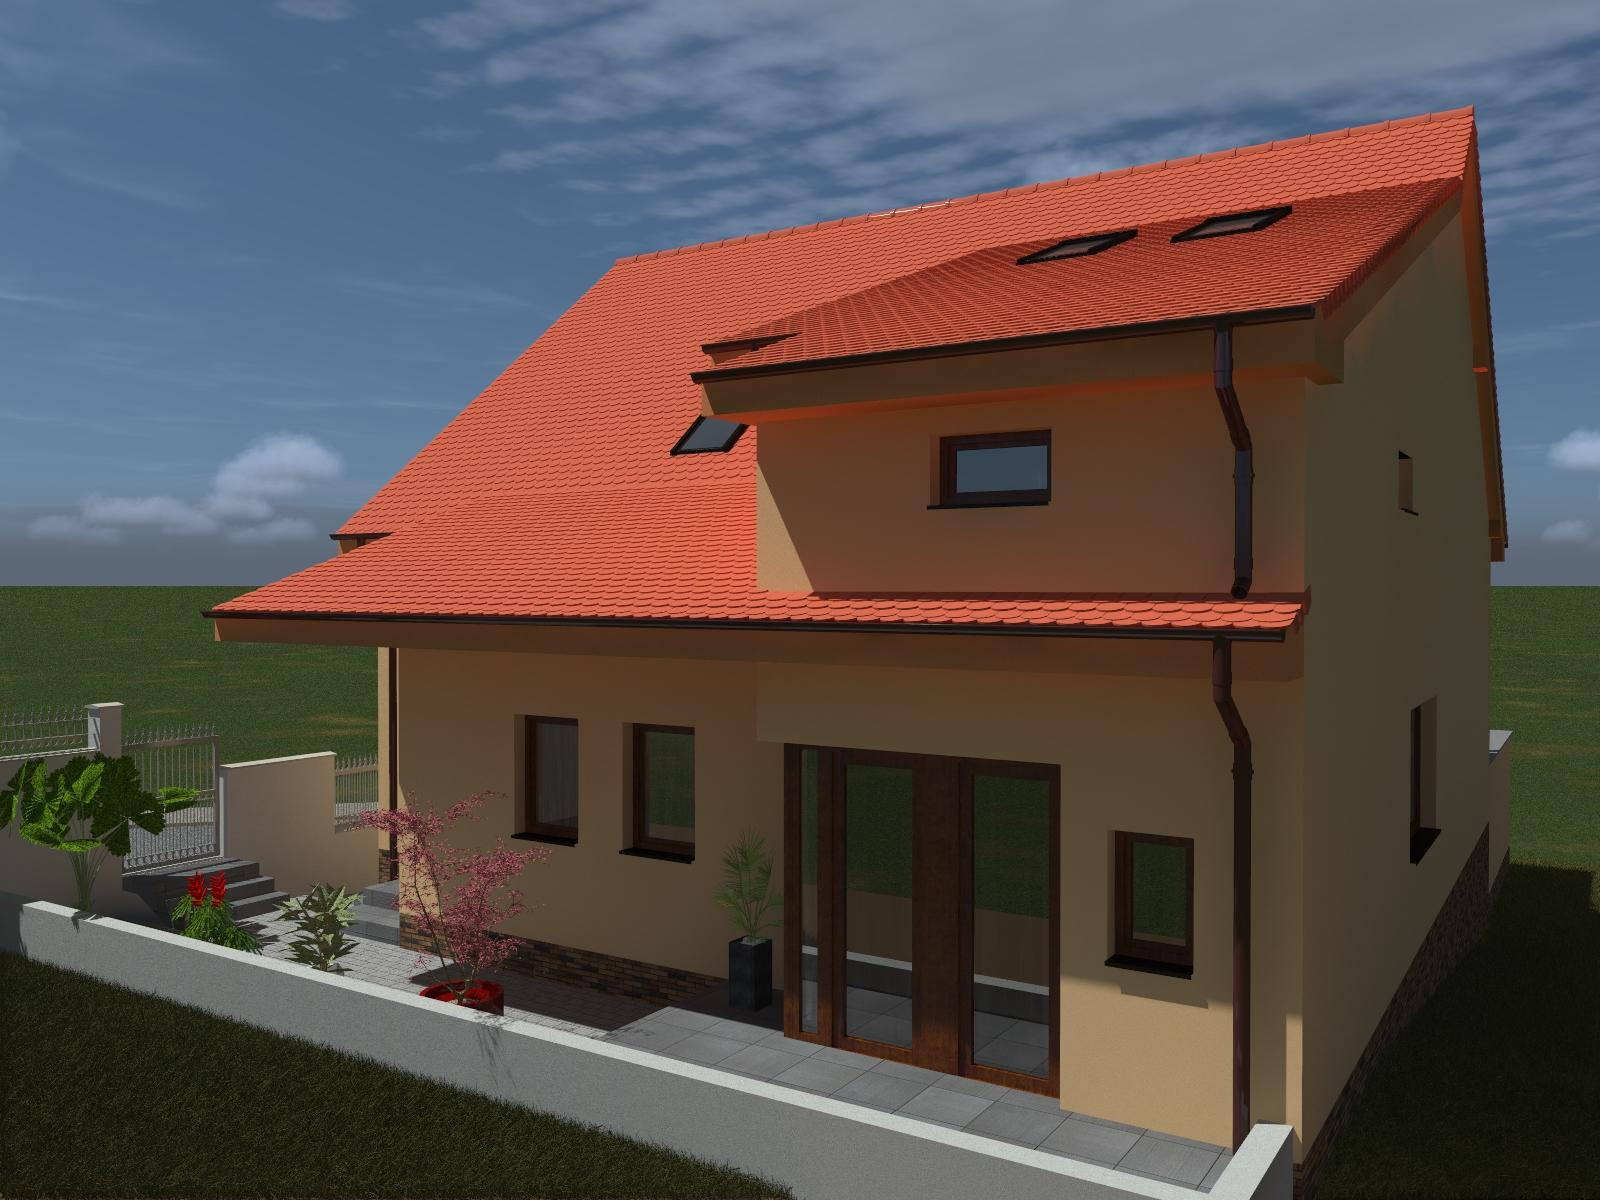 Prestavba podkrovia zo sedlovo valbovej na sedlovú strechu. - Obrázok č. 15